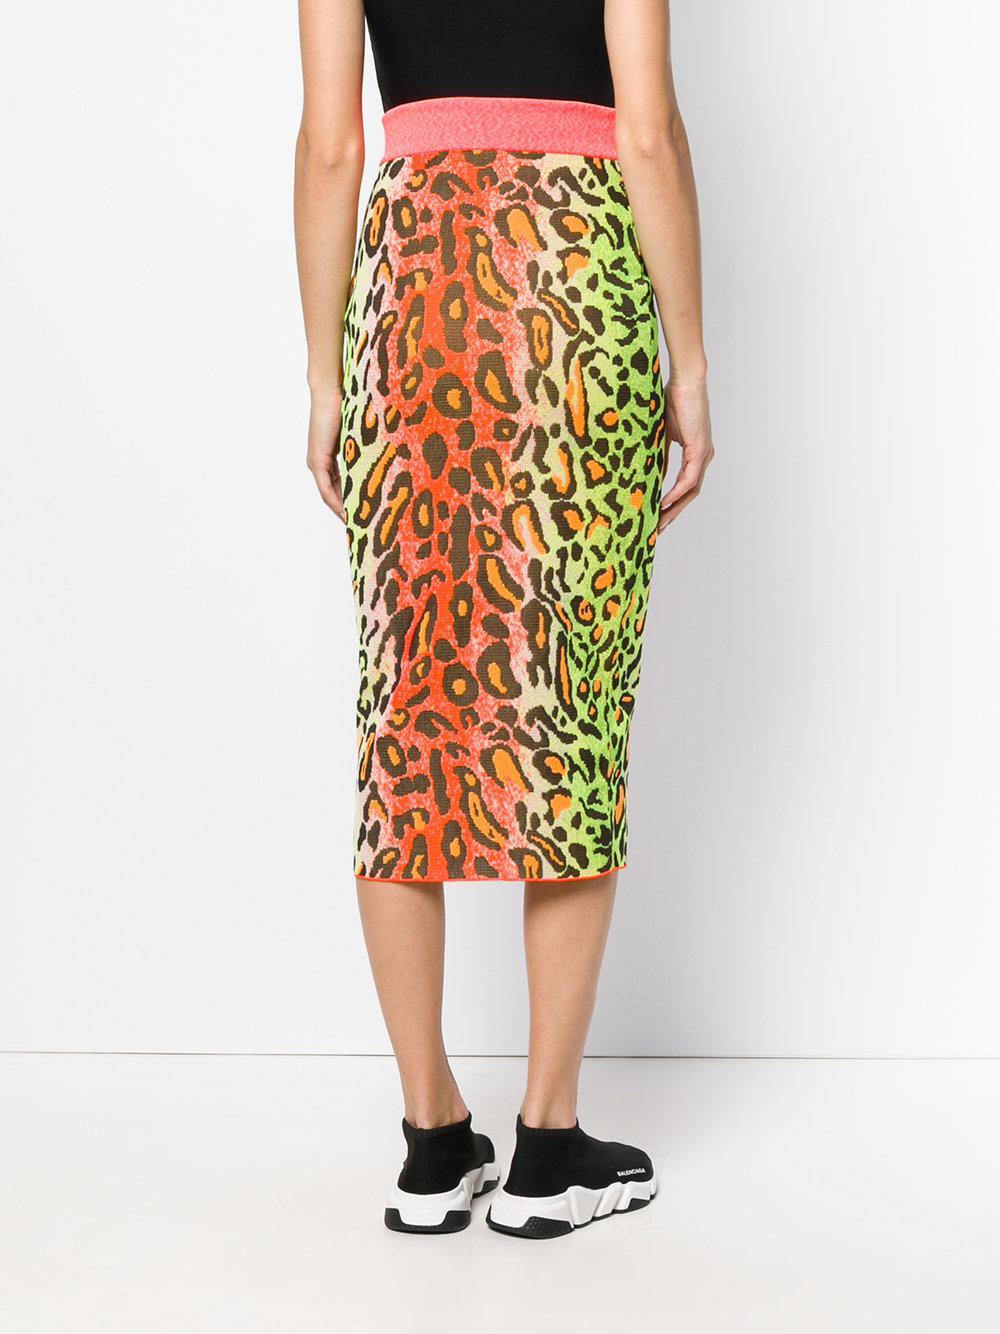 leopard print skirt - Yellow & Orange Stella McCartney Cheap Sale For Sale 1CFXEBc2E